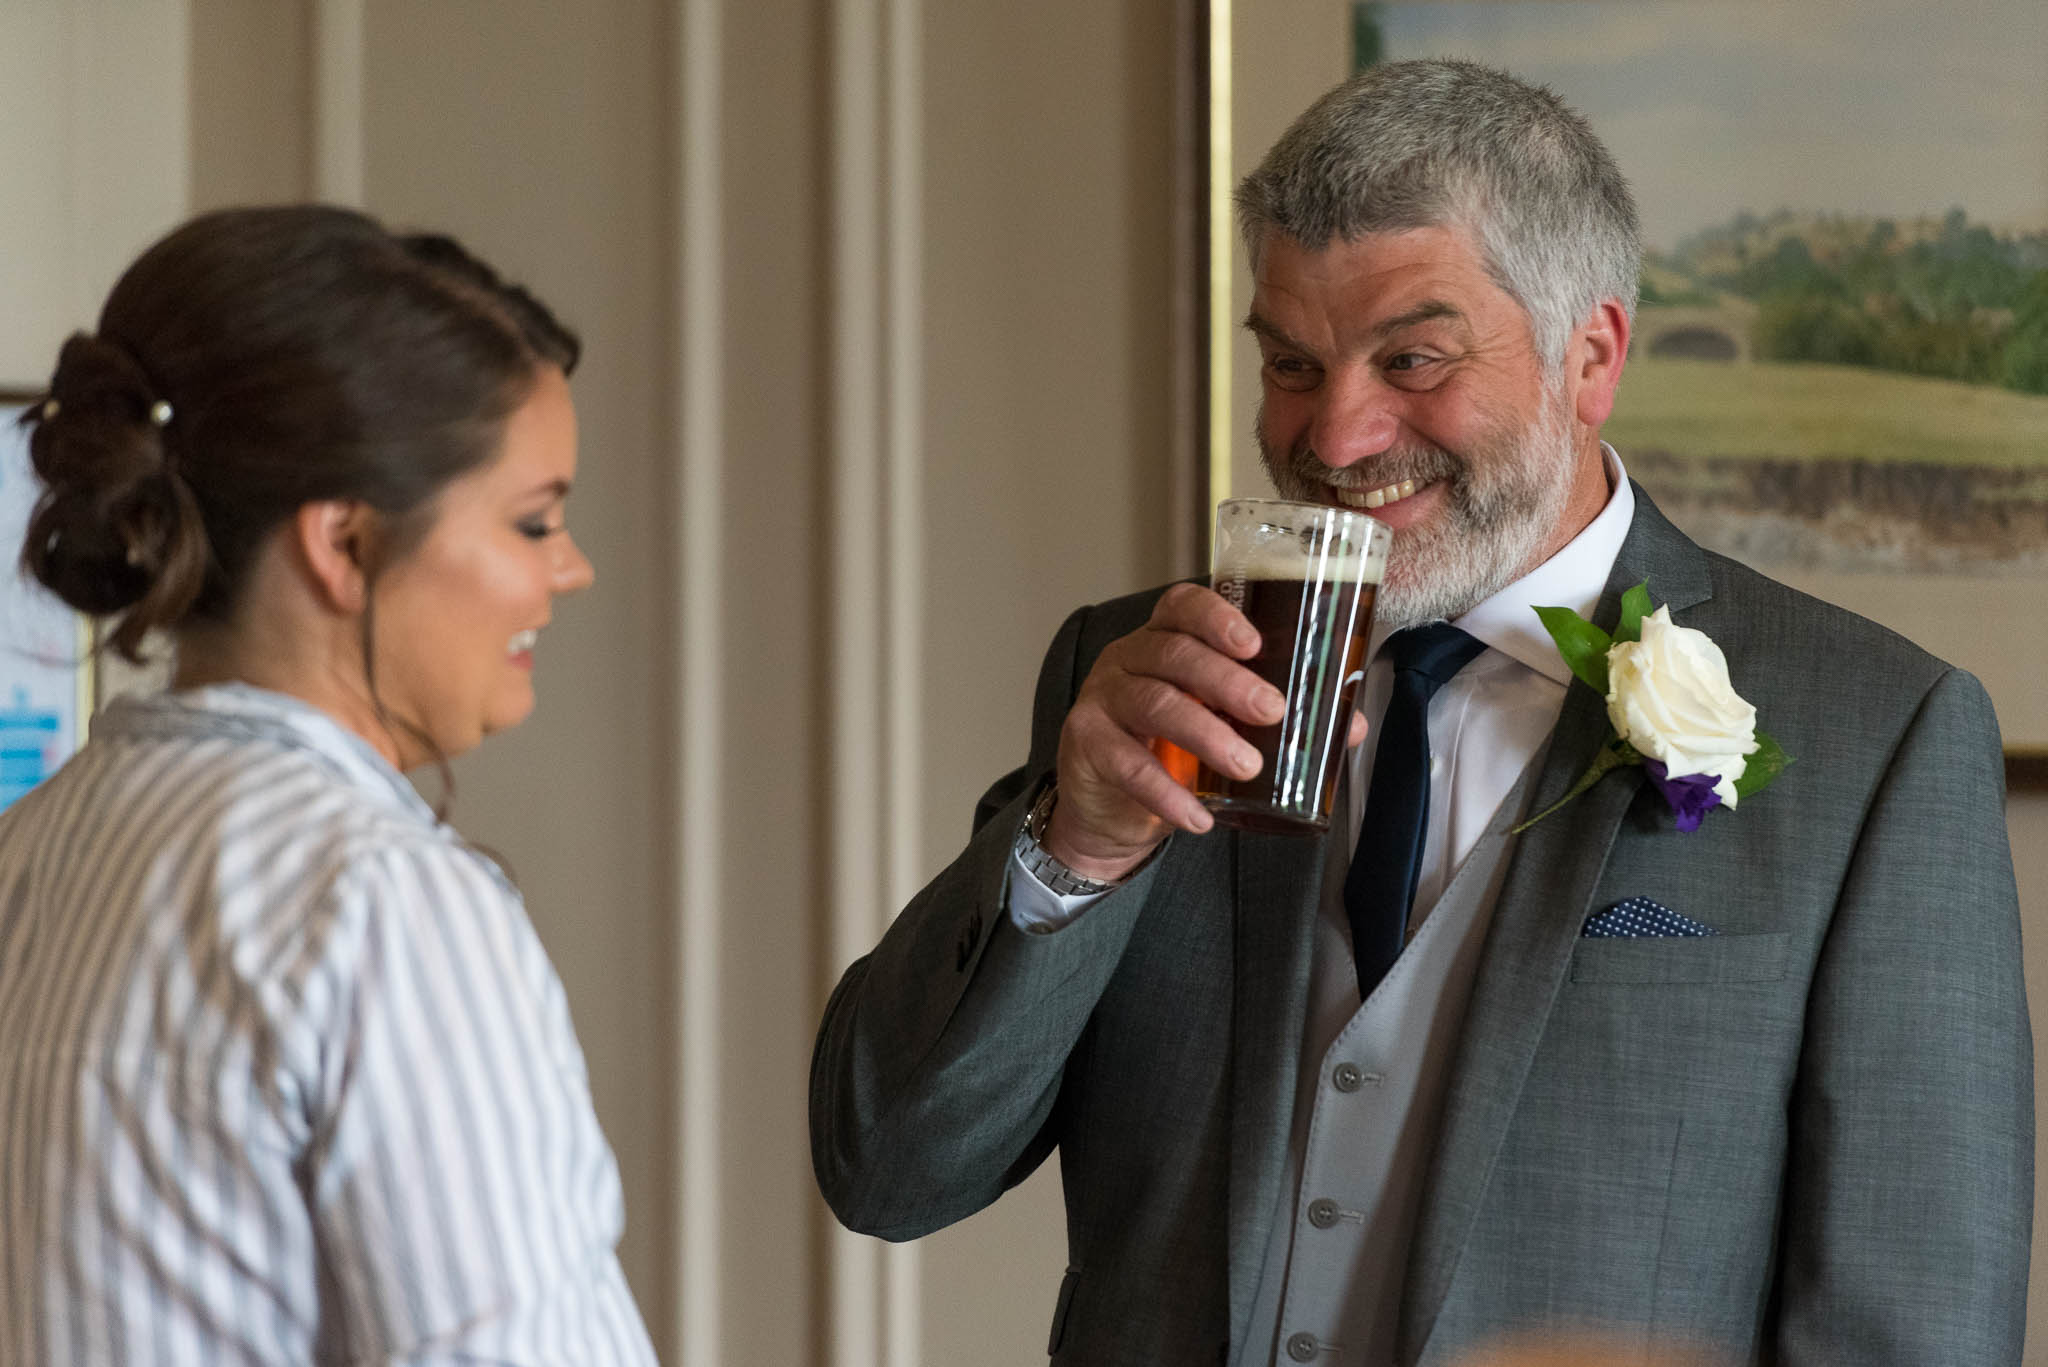 Crathorne Hall Hotel Wedding Photographer34.jpg